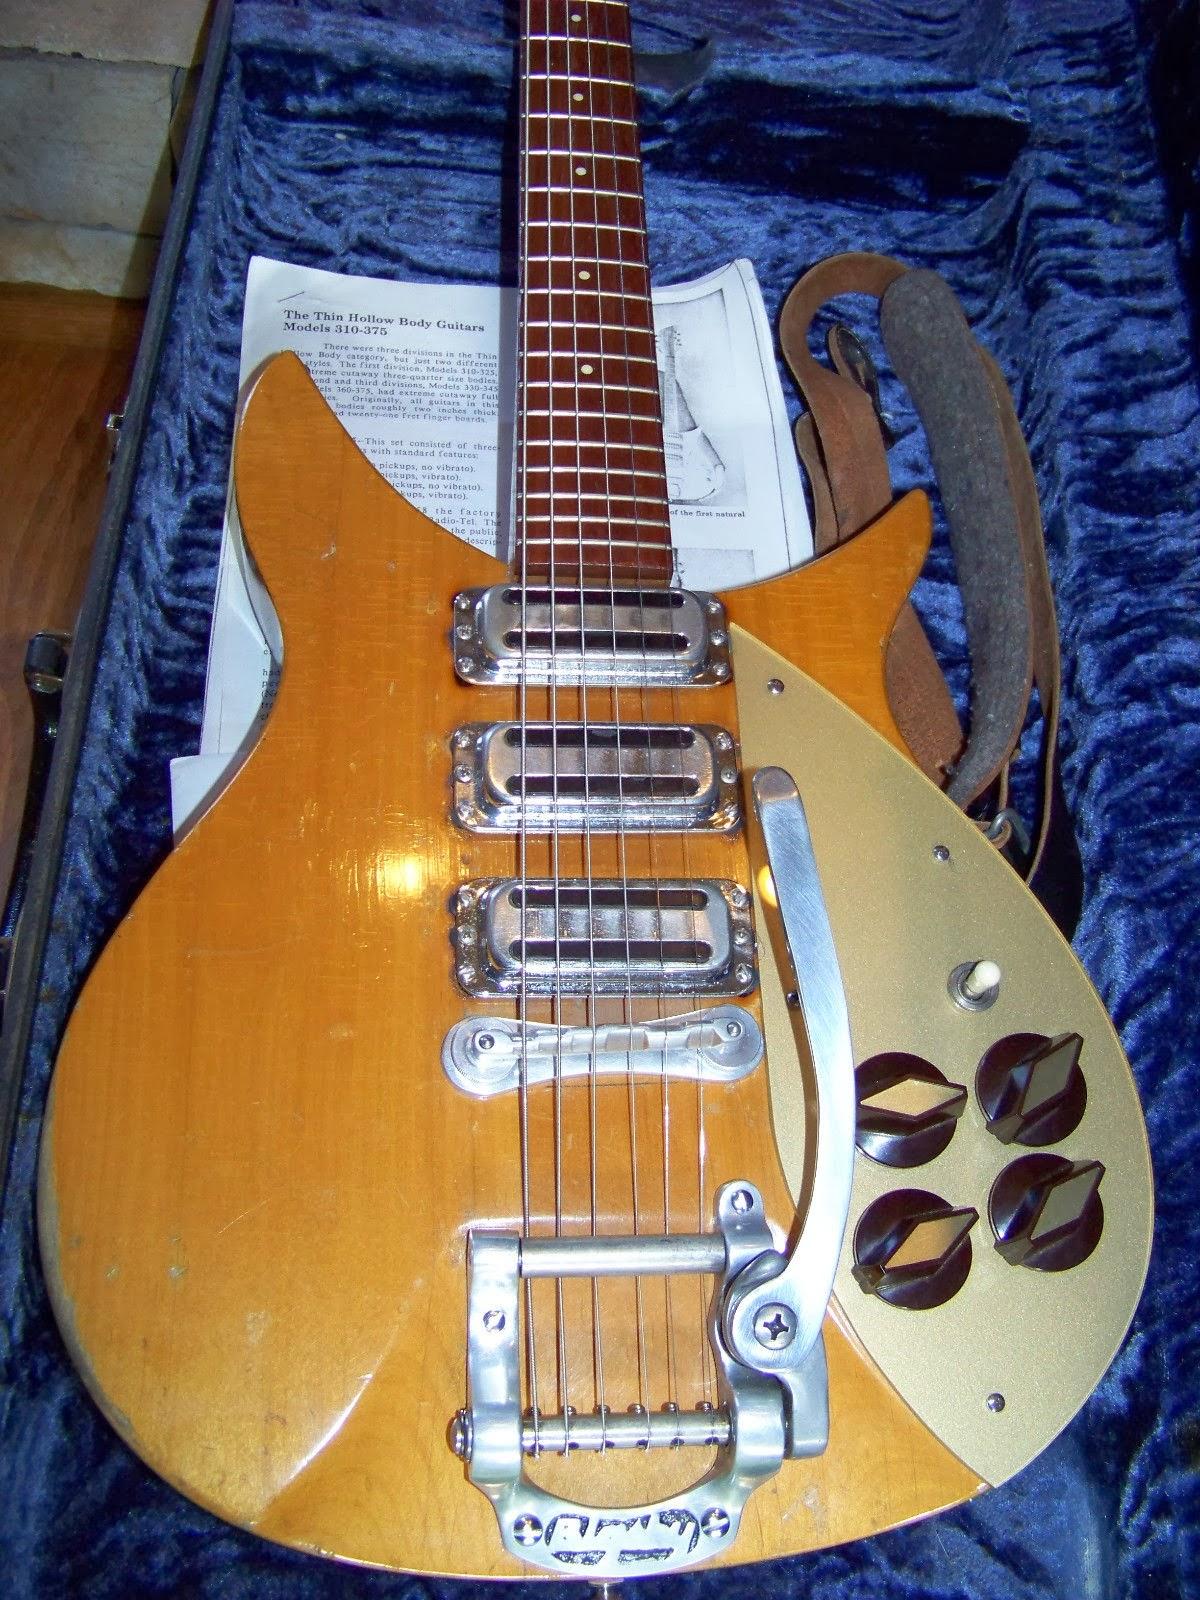 1958 Rickenbacker 325 Wiring Diagram Online Manuual Of Harness For Guitar Vintage Guitarz Carpi V82 John Lennon Rh Vintageguitarz Com